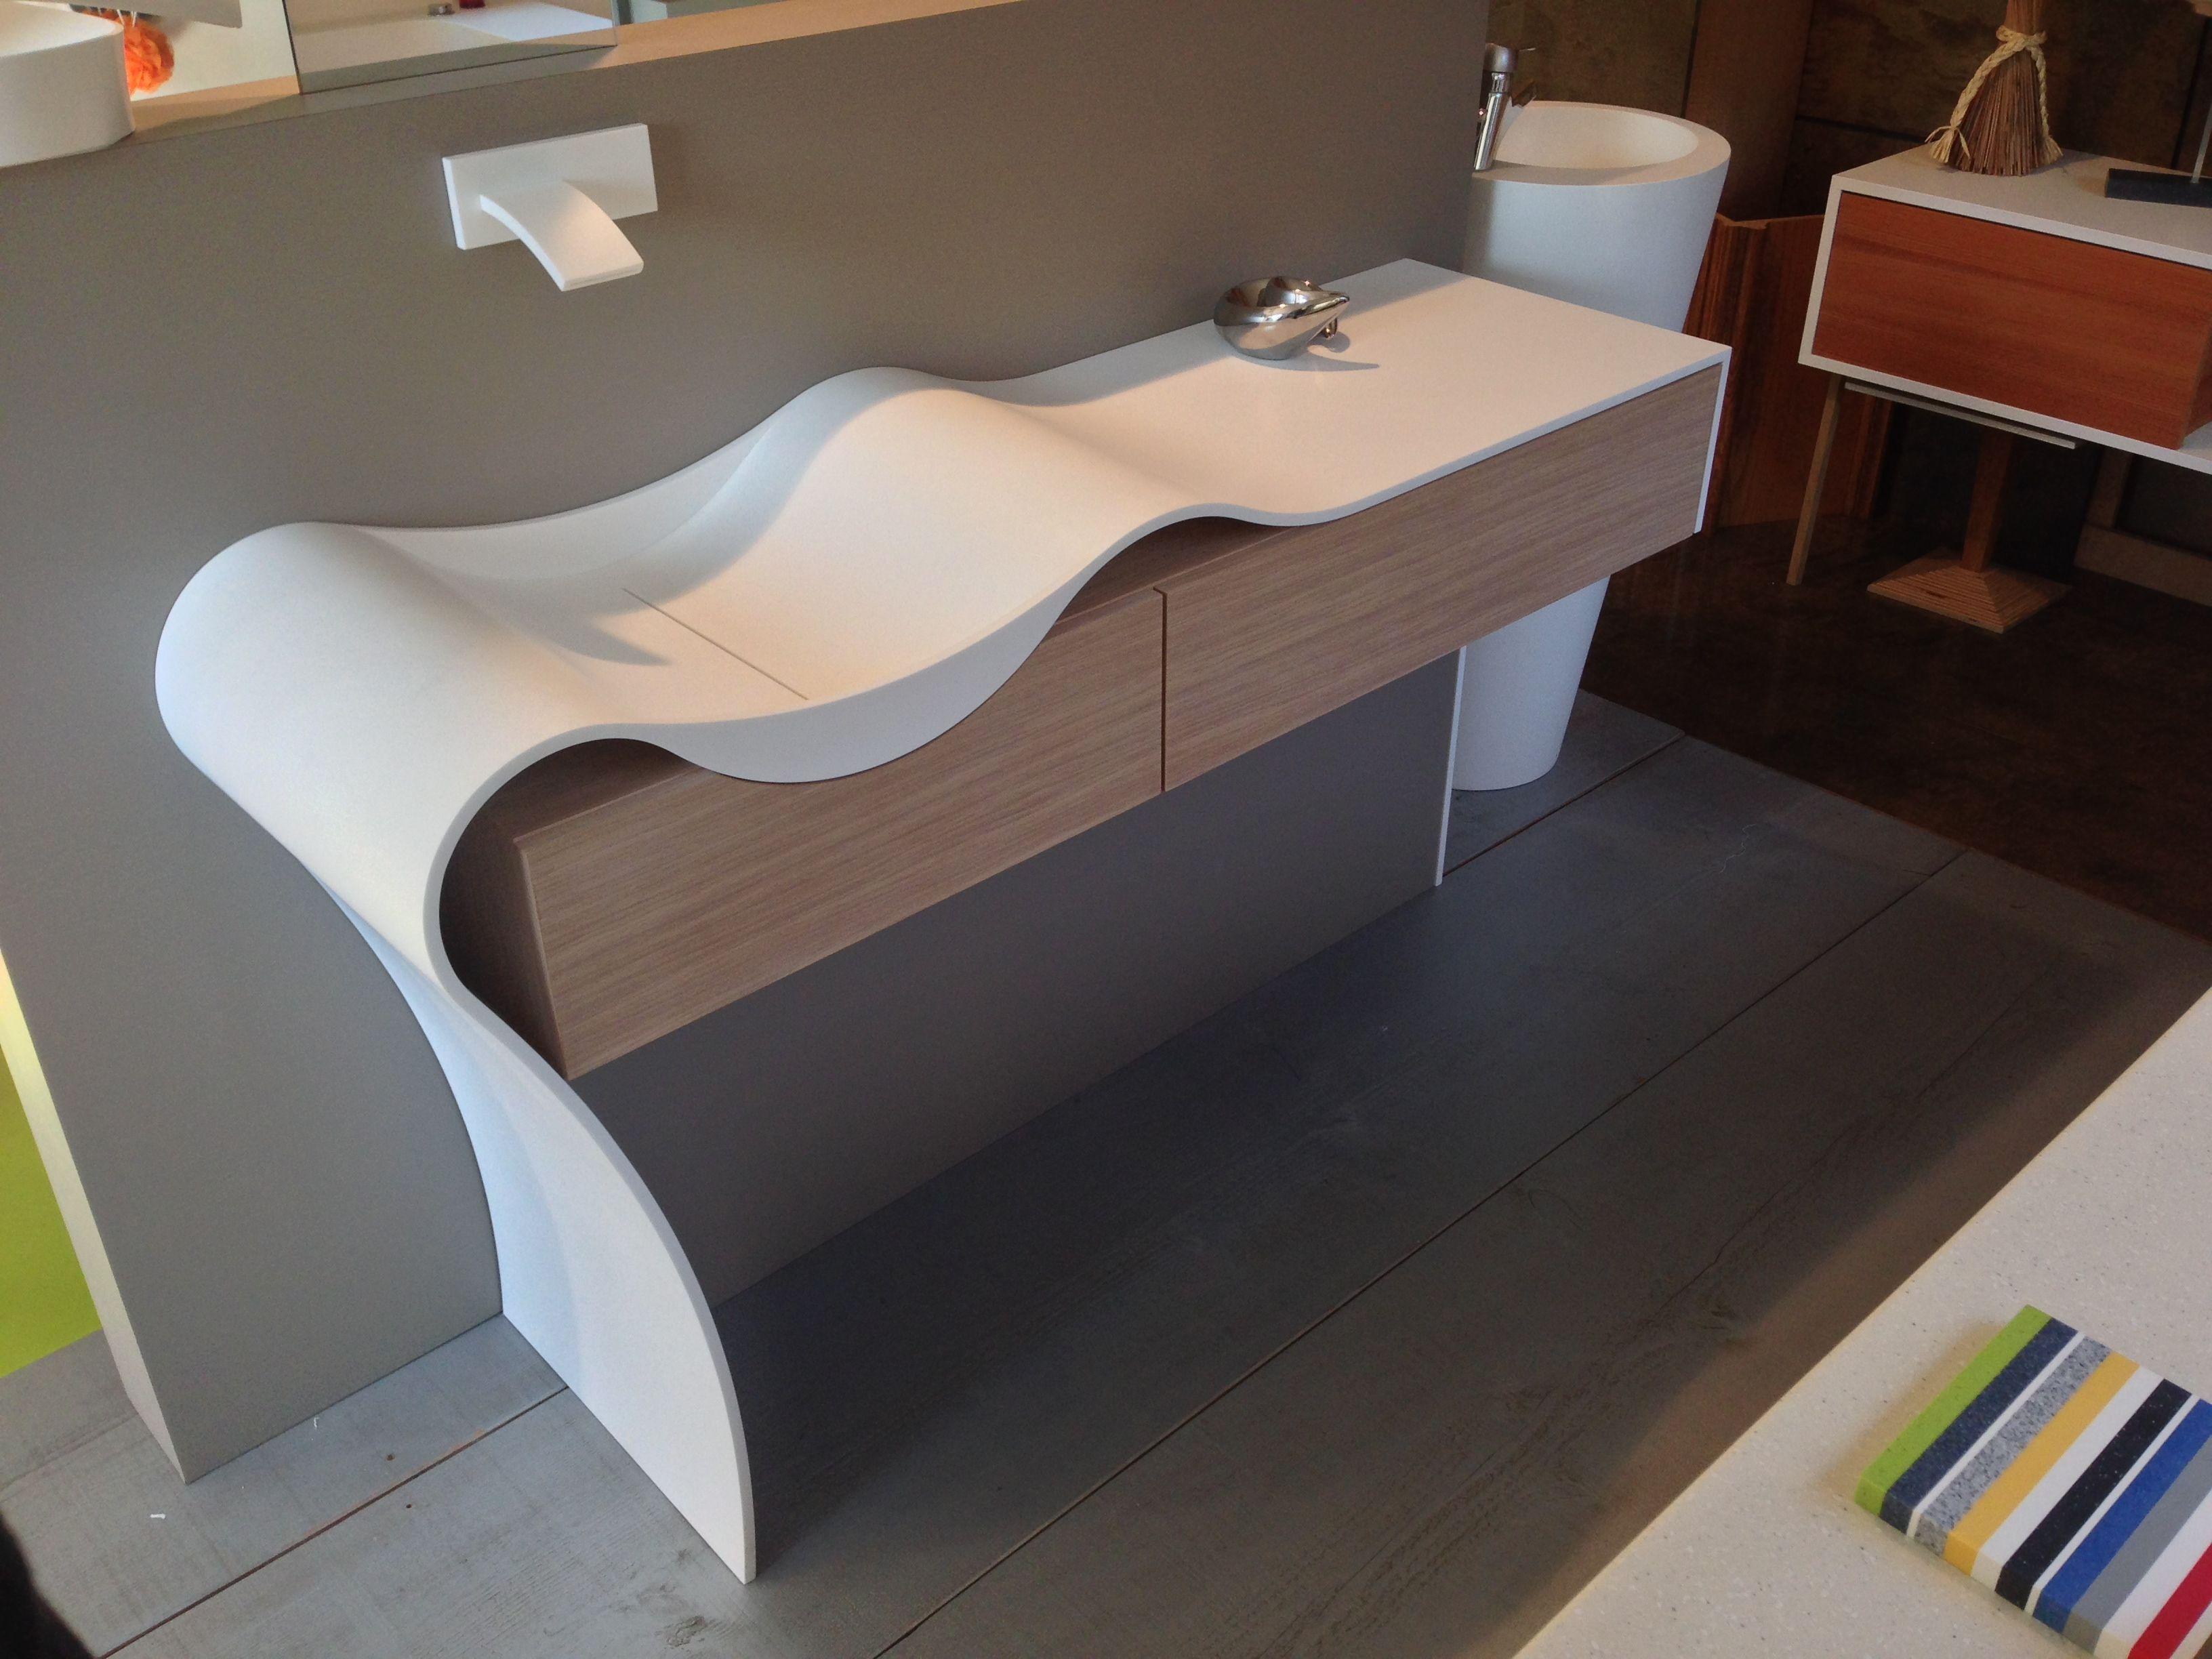 plan vasque en r sine de synth se meuble mobilier. Black Bedroom Furniture Sets. Home Design Ideas